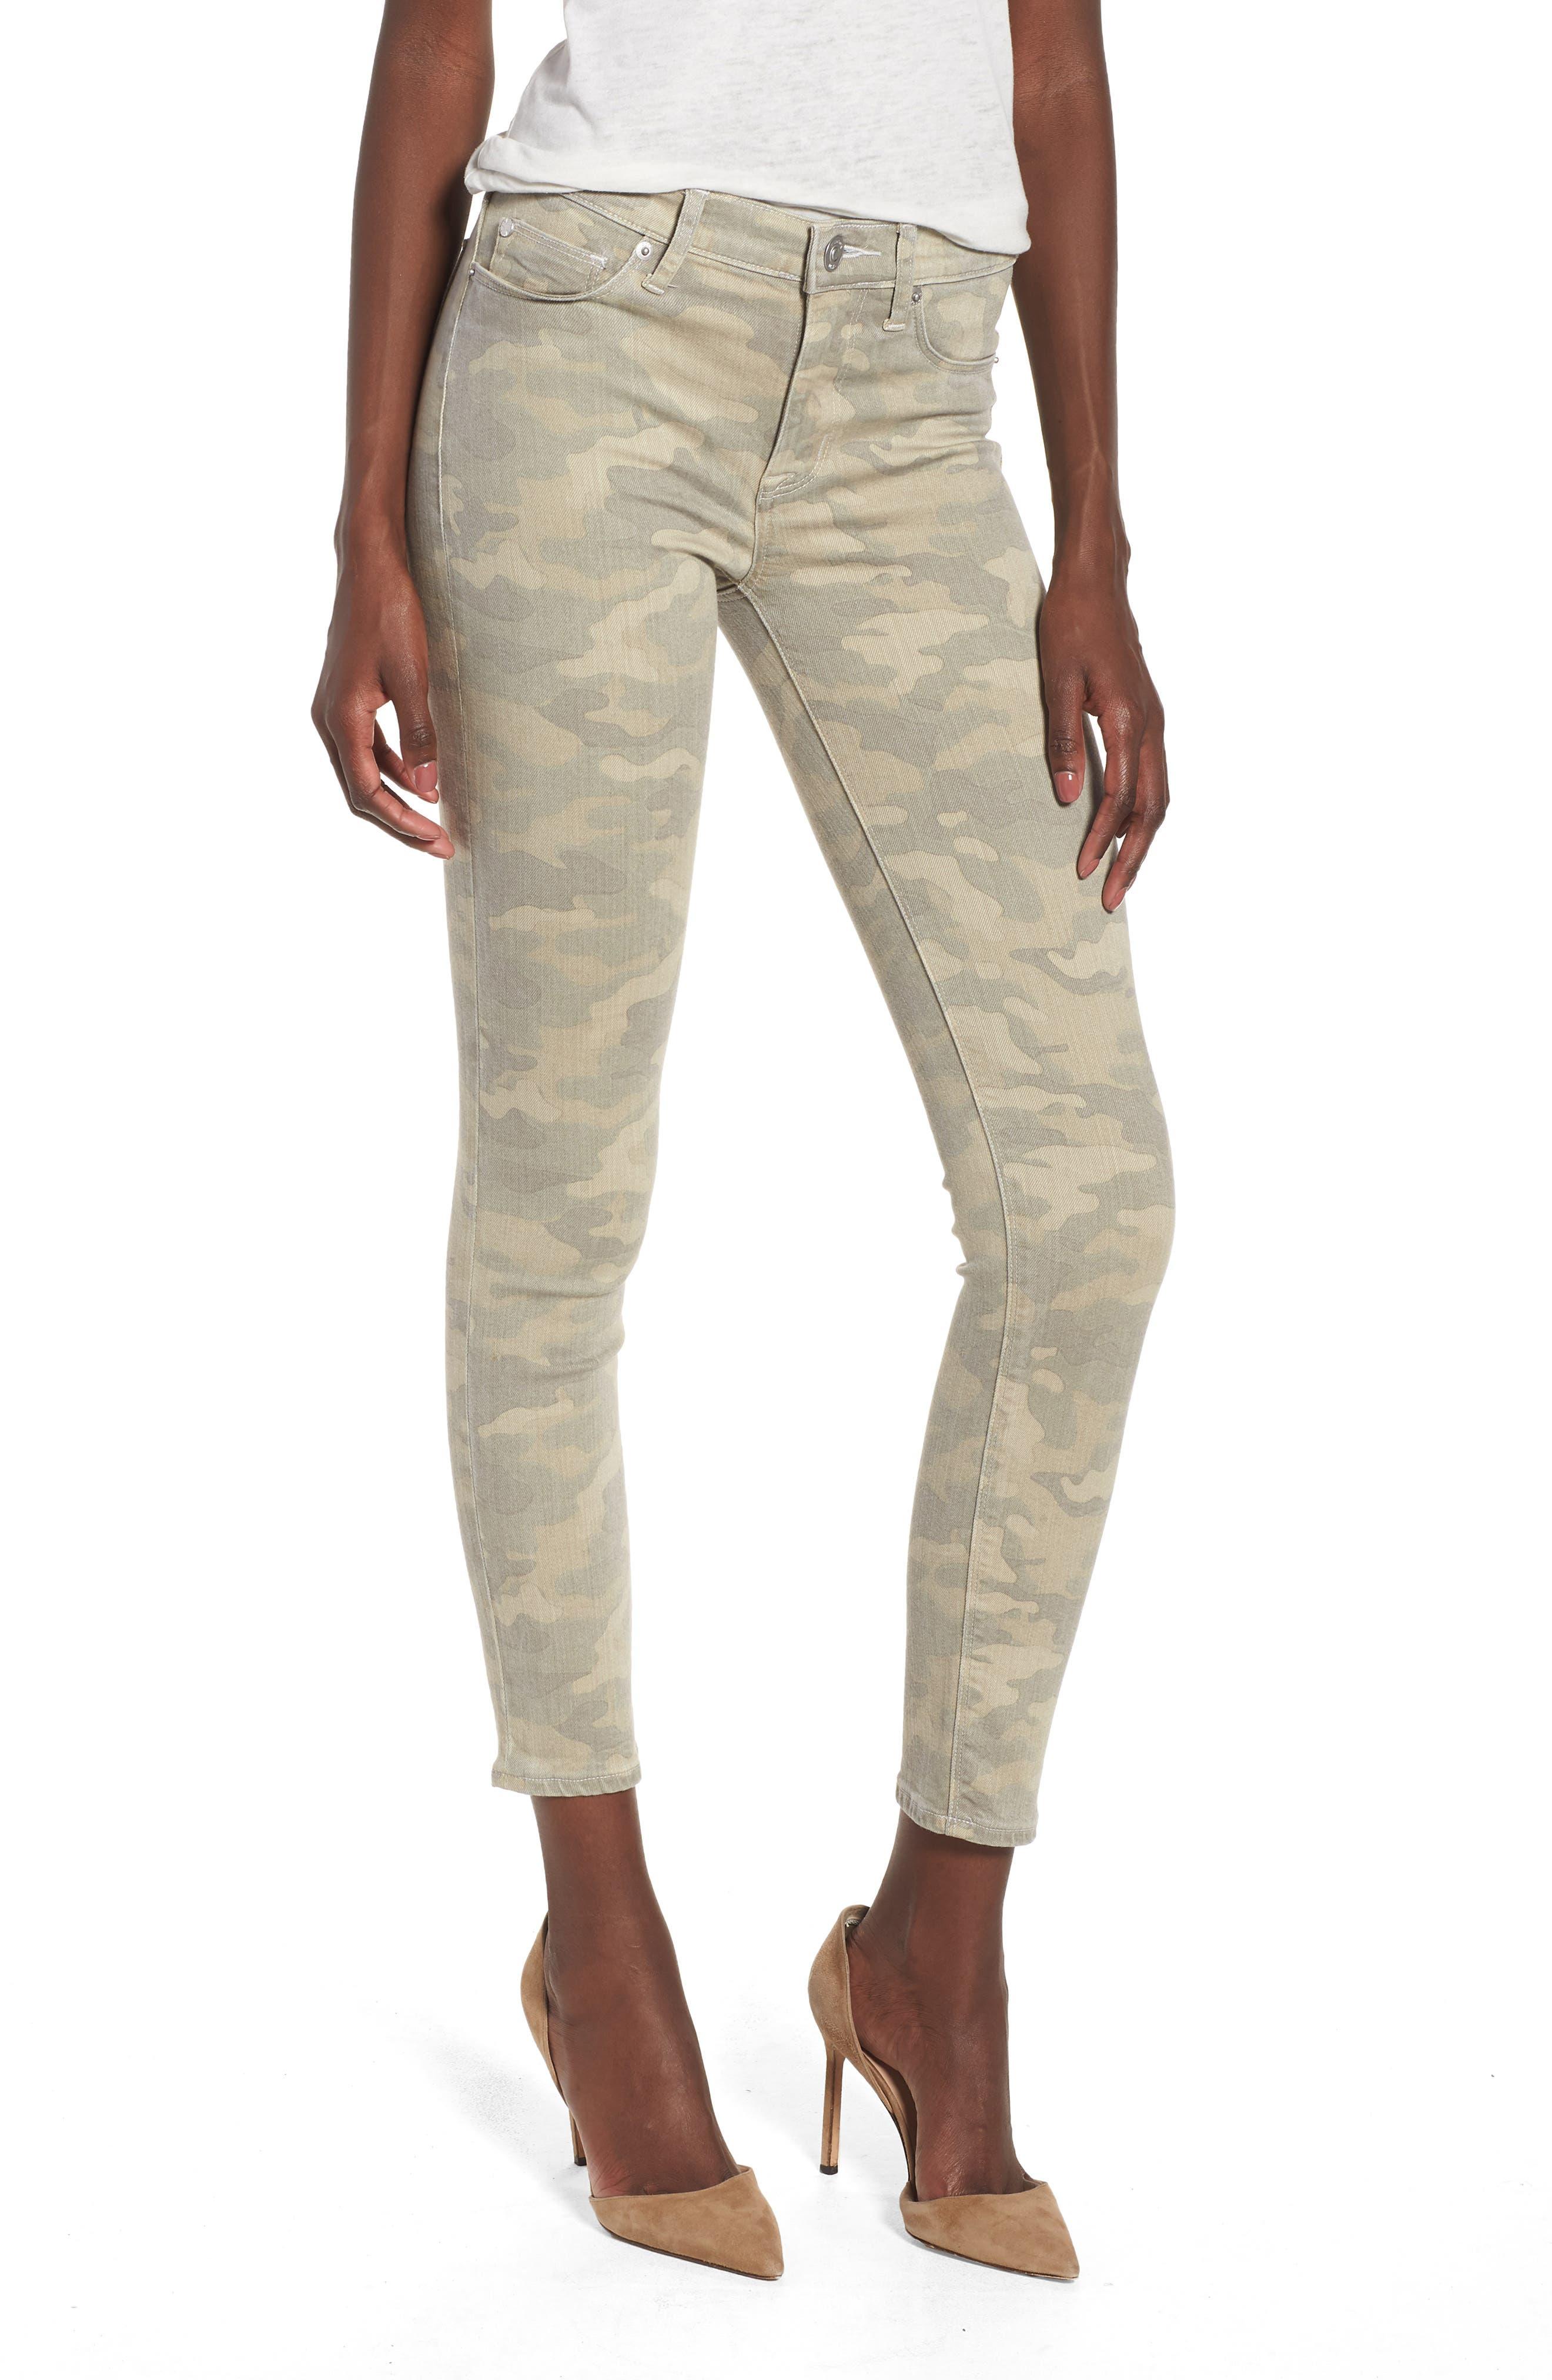 Alternate Image 1 Selected - Hudson Jeans 'Nico' Ankle Skinny Jeans